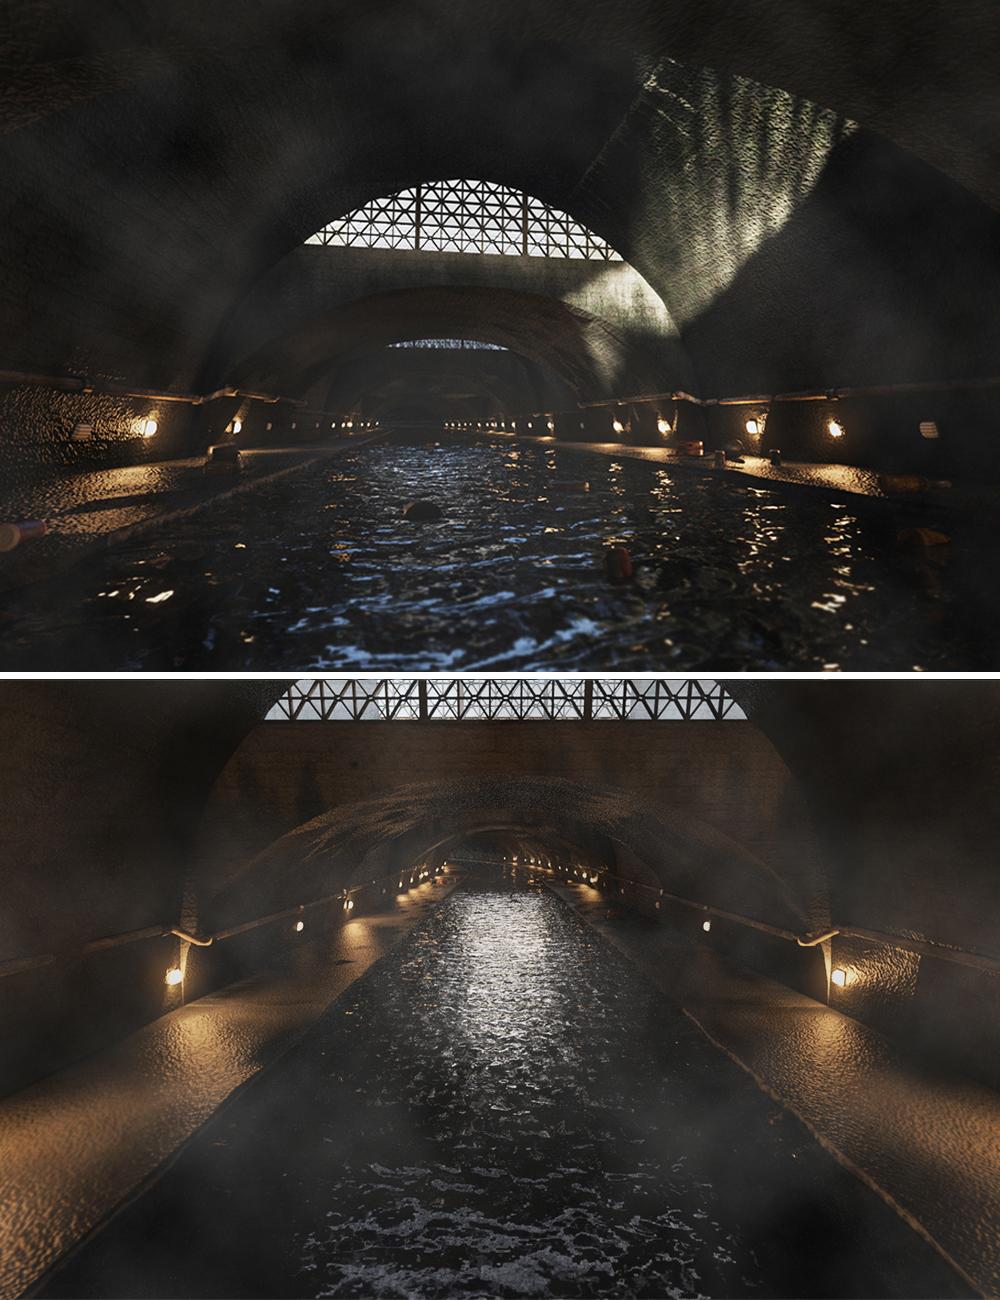 Sheffield Sewer by: PerspectX, 3D Models by Daz 3D